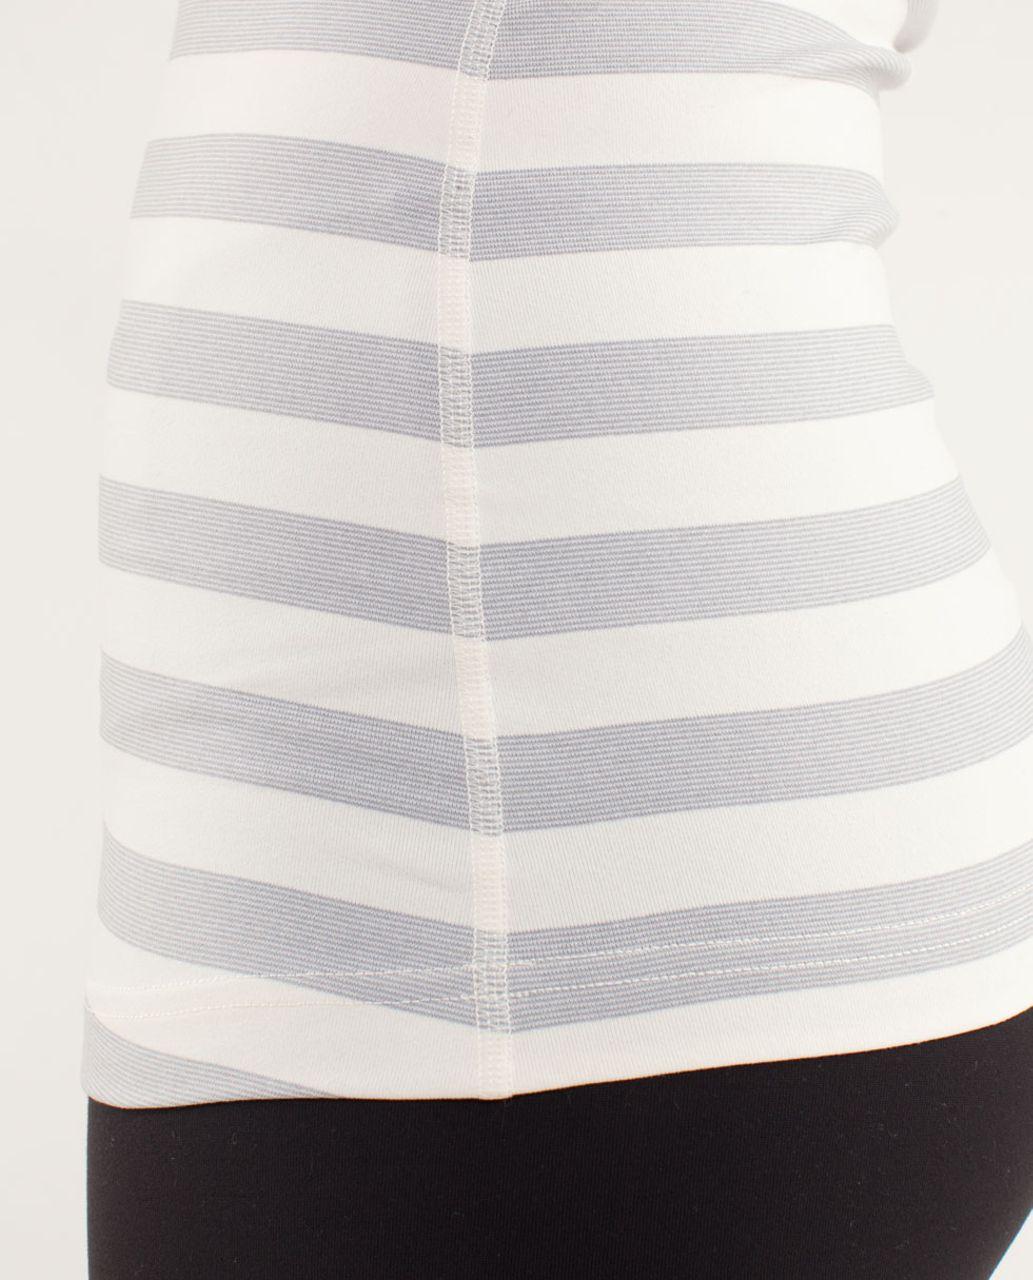 Lululemon Cool Racerback - Micro Macro Polar Cream Silver Slate